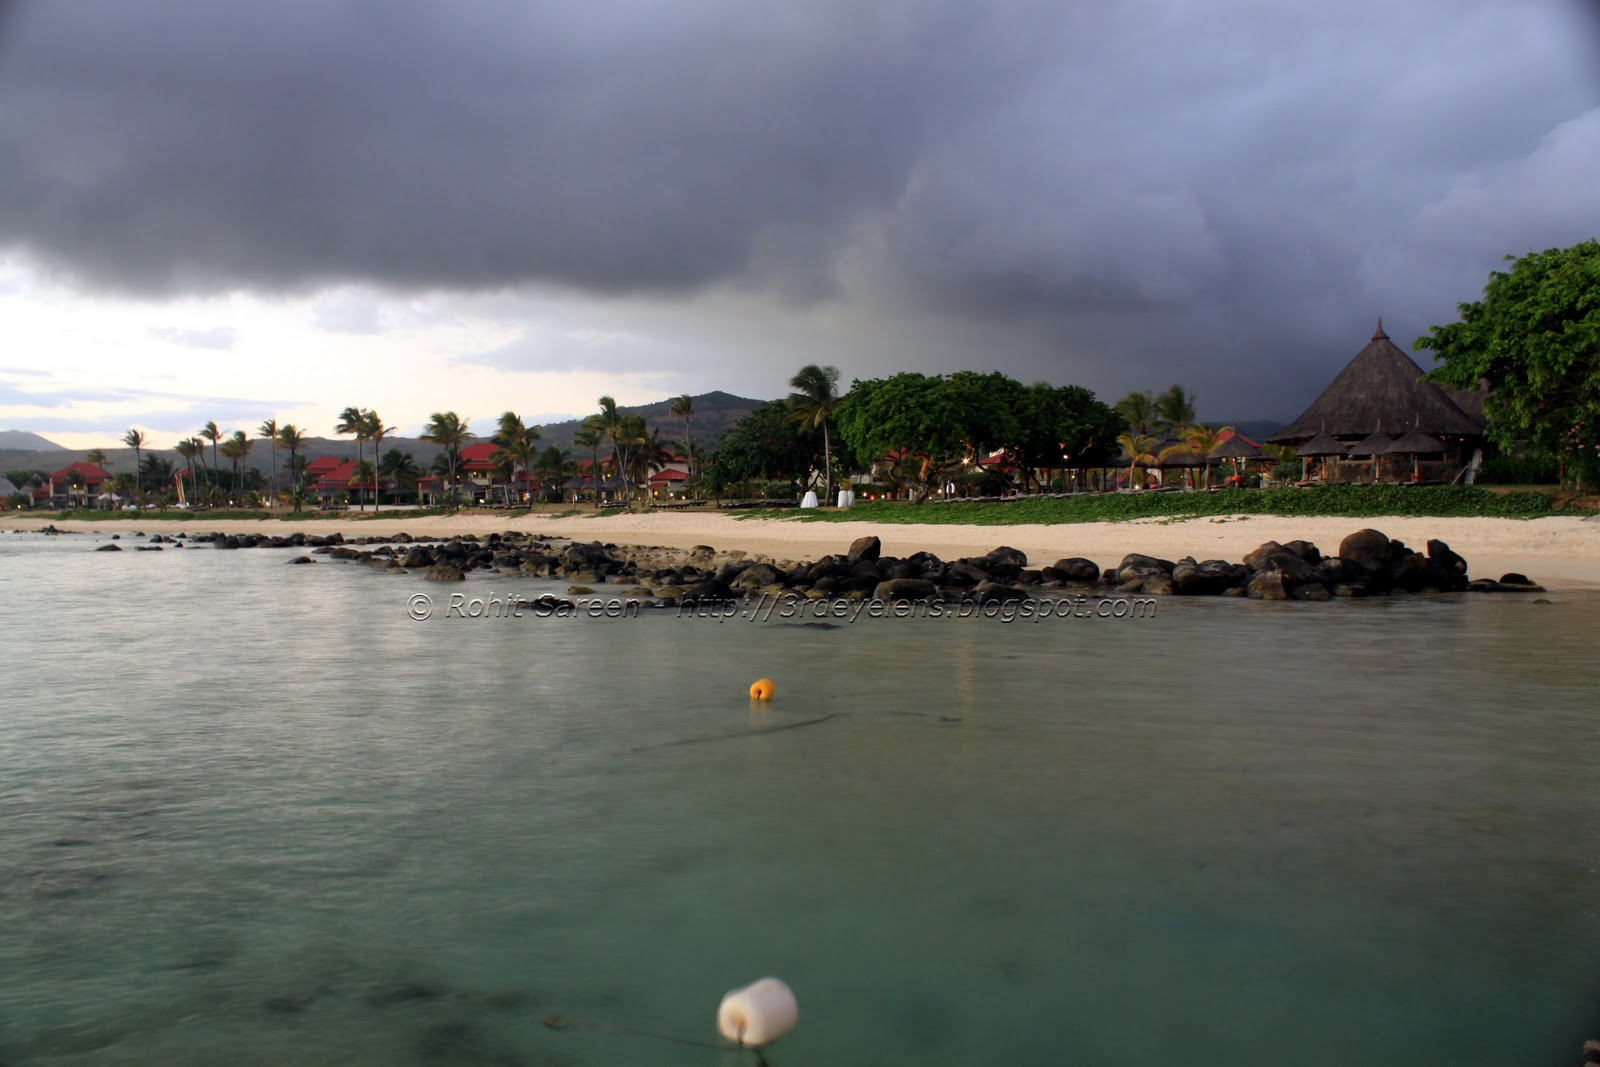 http://2.bp.blogspot.com/-CoWVe_m3Y8k/Tsnzzel7Z1I/AAAAAAAAClg/kvw0T18skvw/s1600/Beach+Side+Resort+along+the+Indian+Ocean%252C+water%252C+Mauritius.jpg